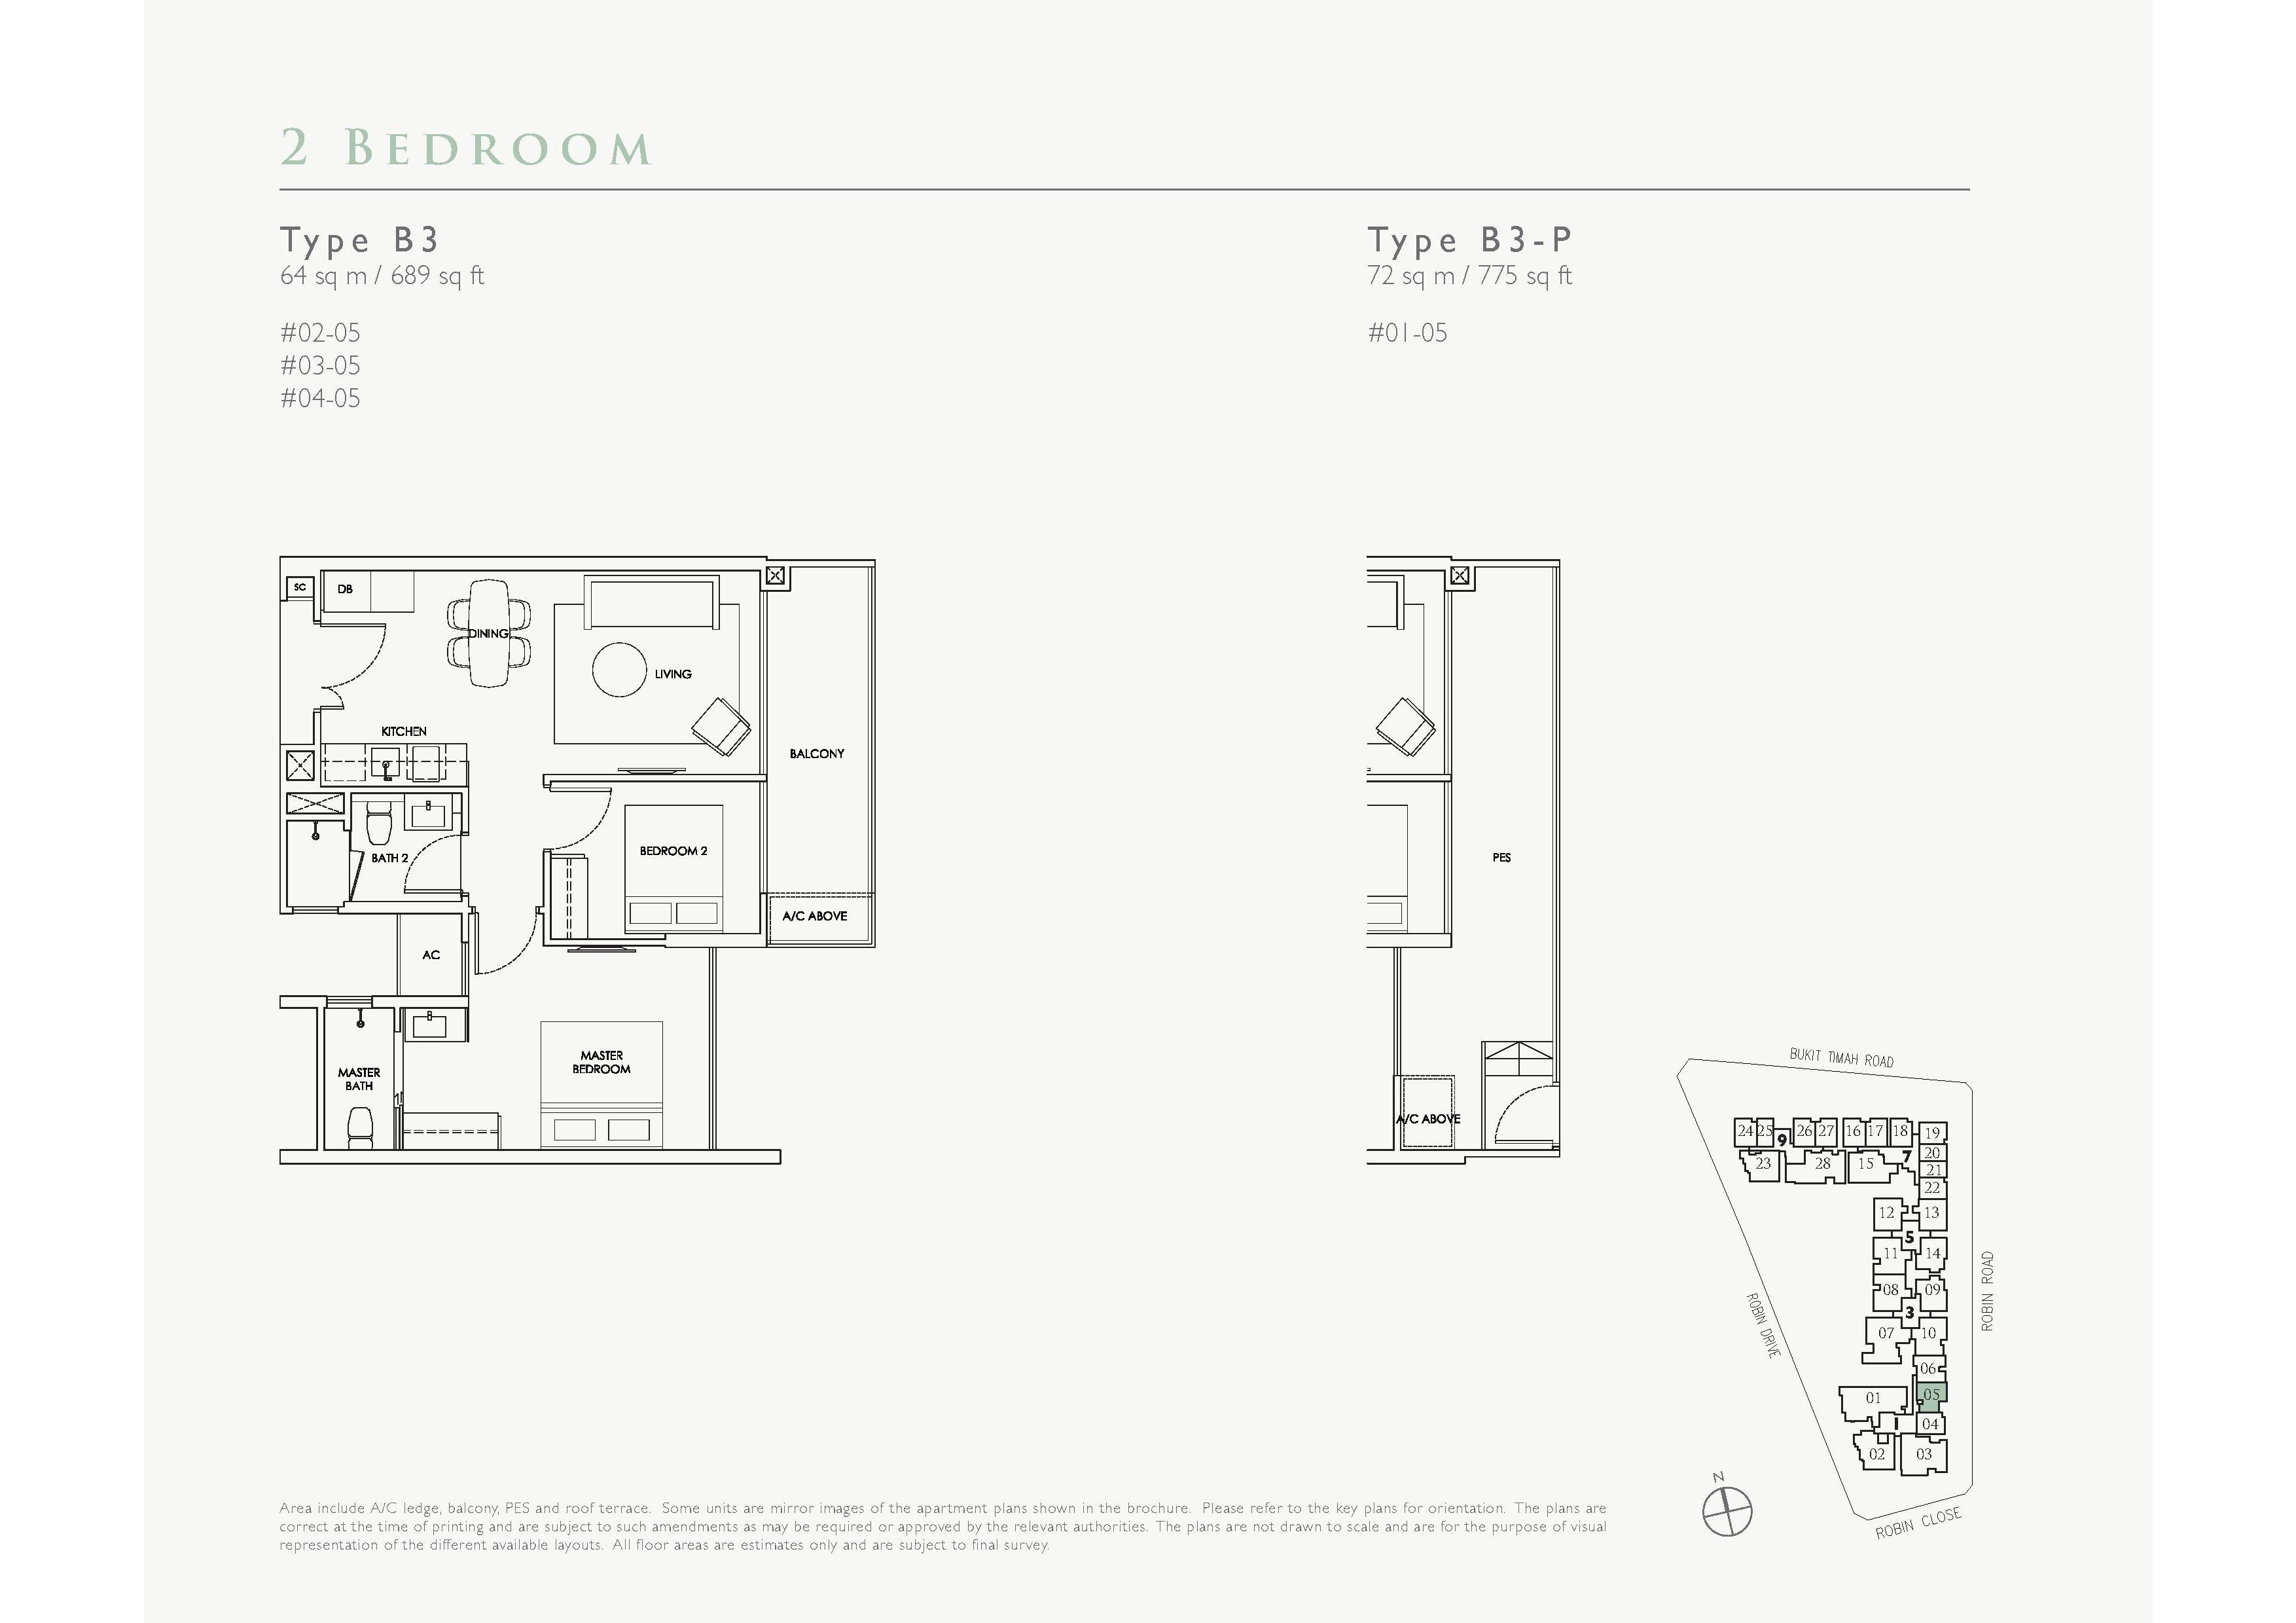 Robin Residences 2 Bedroom Floor Plans Type B3, B3-P